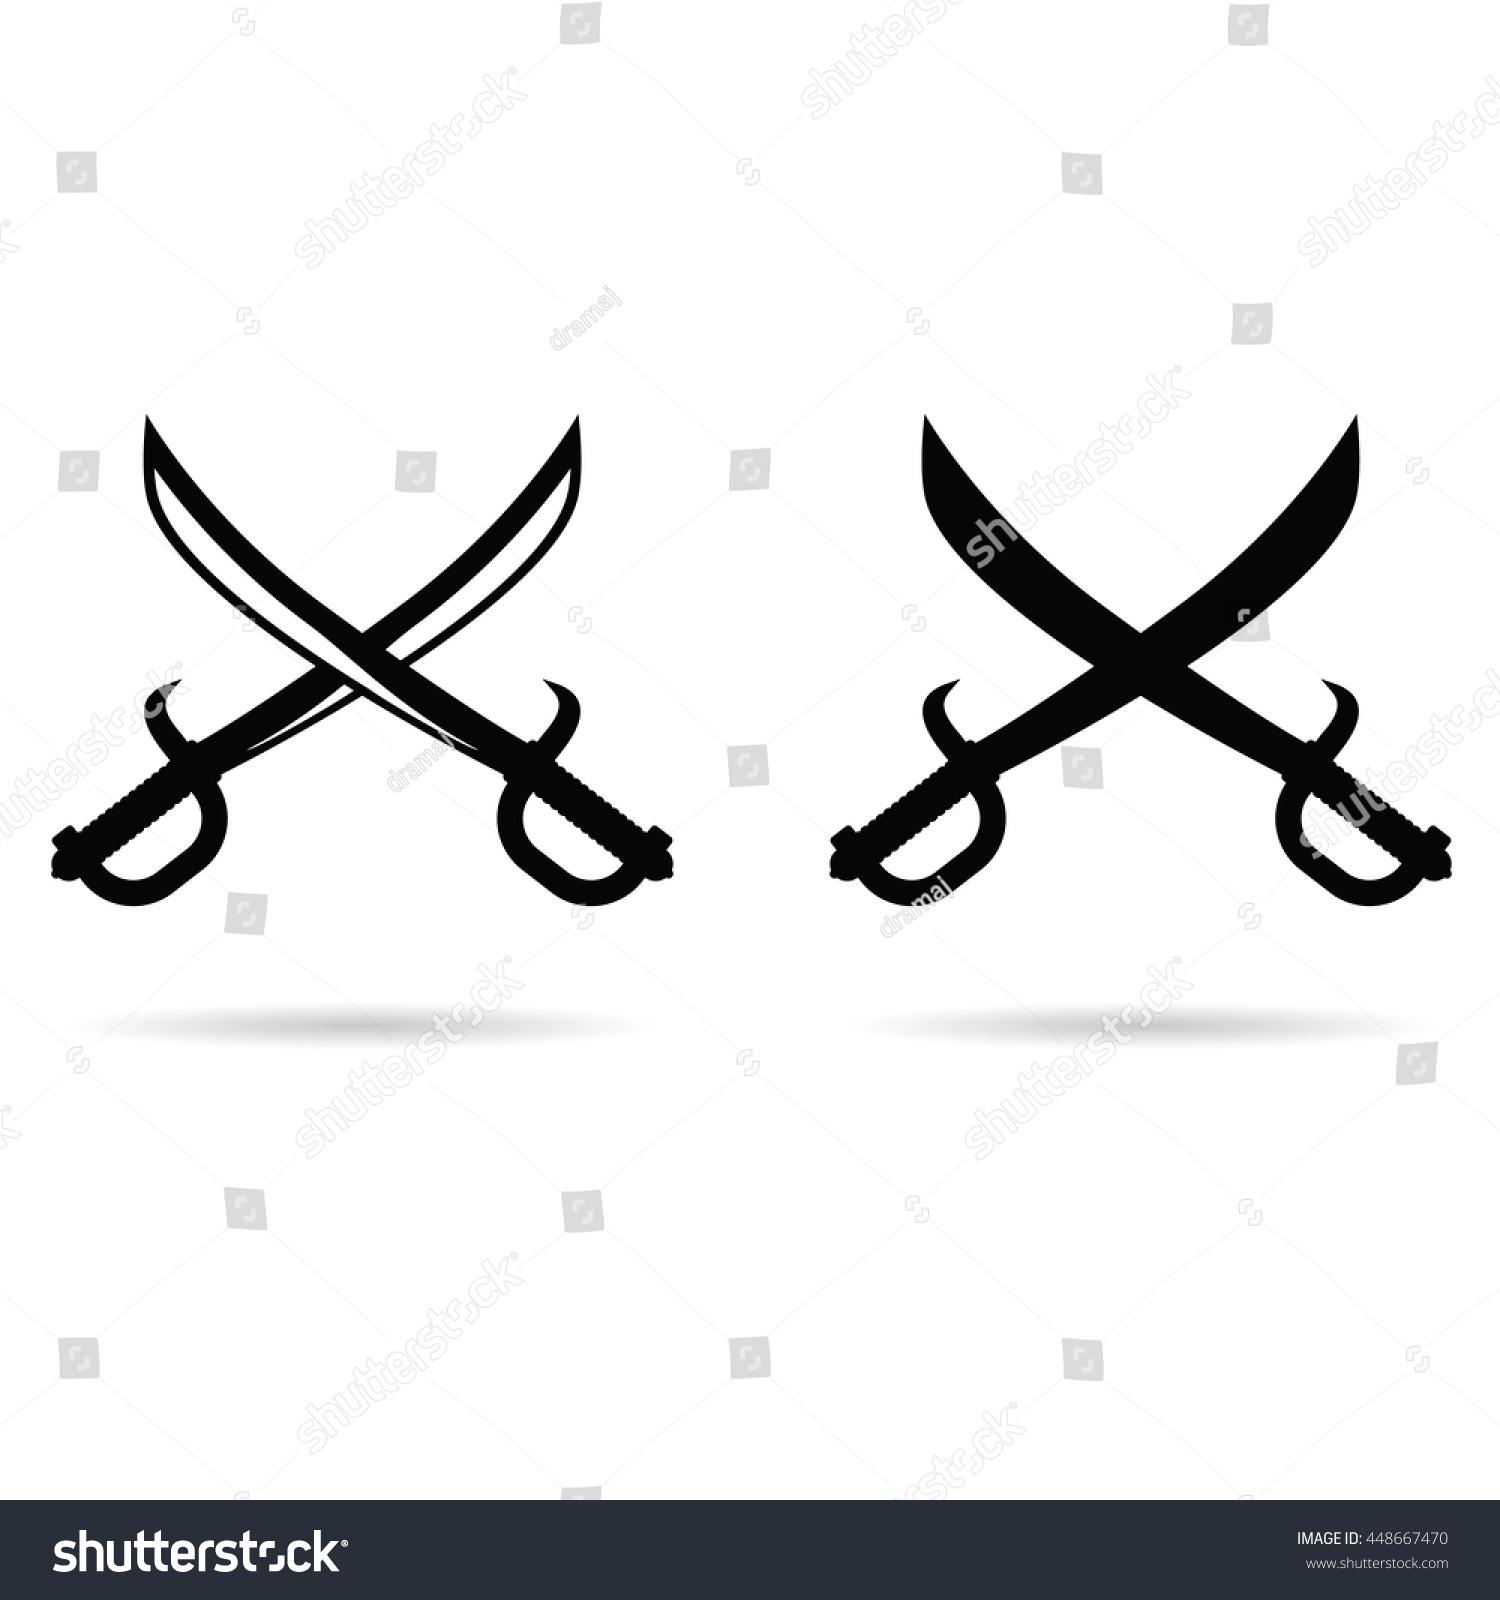 pirate sword set black color illustration stock vector 448667470